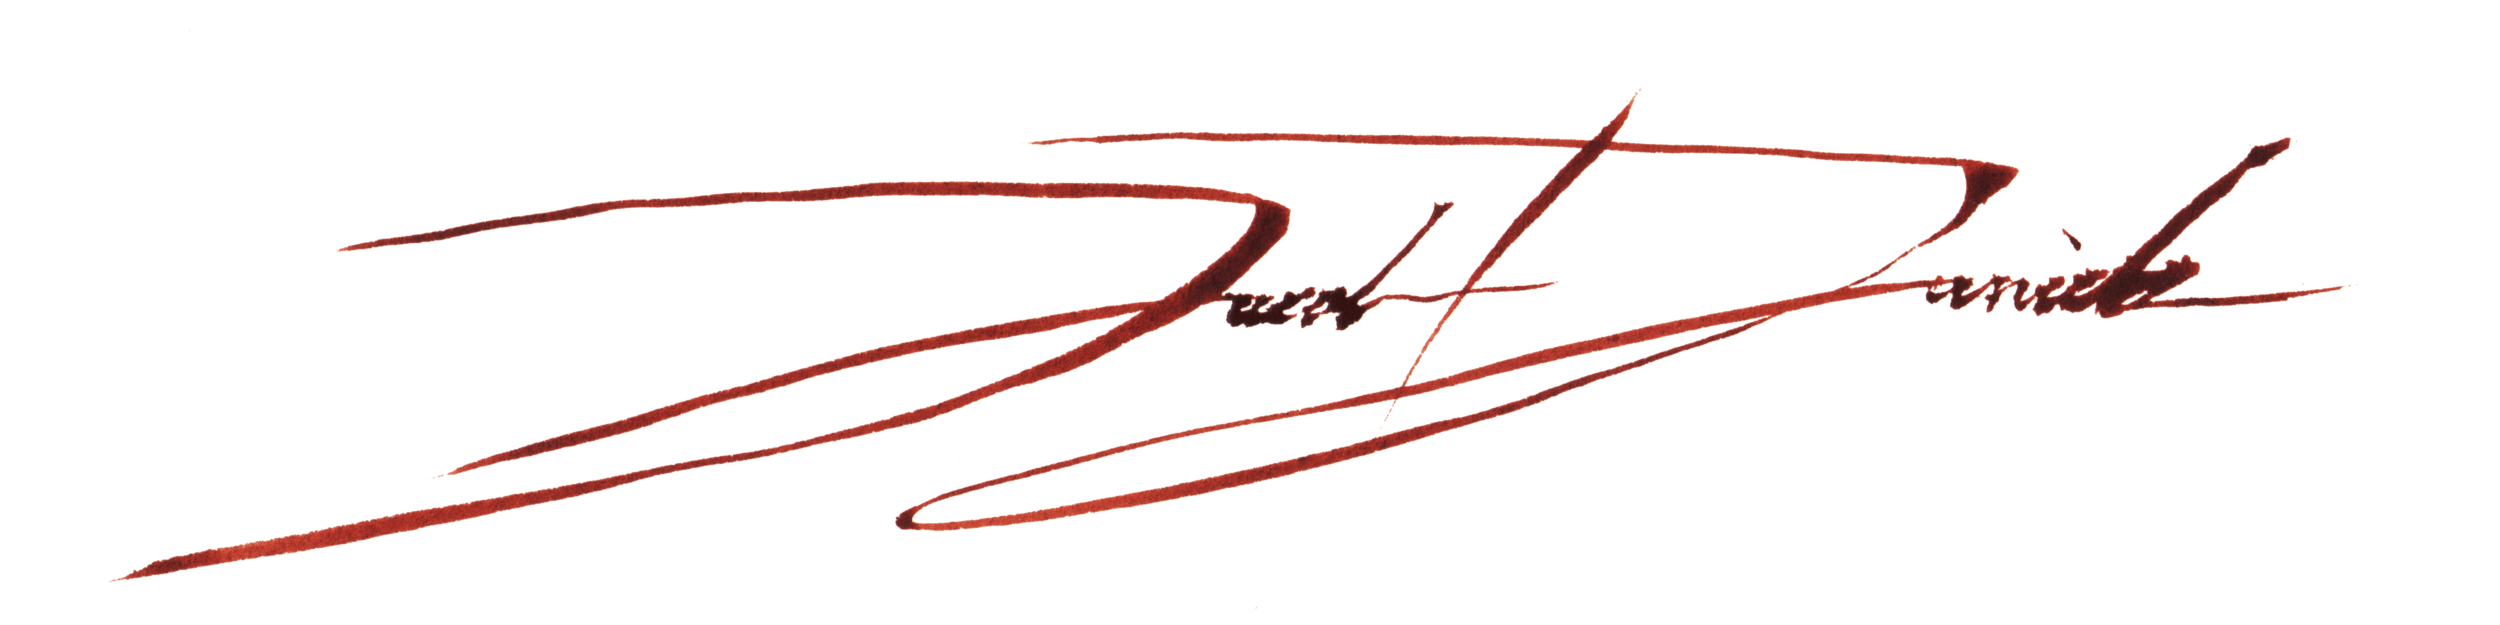 Signature©overflowstudios-copy.png